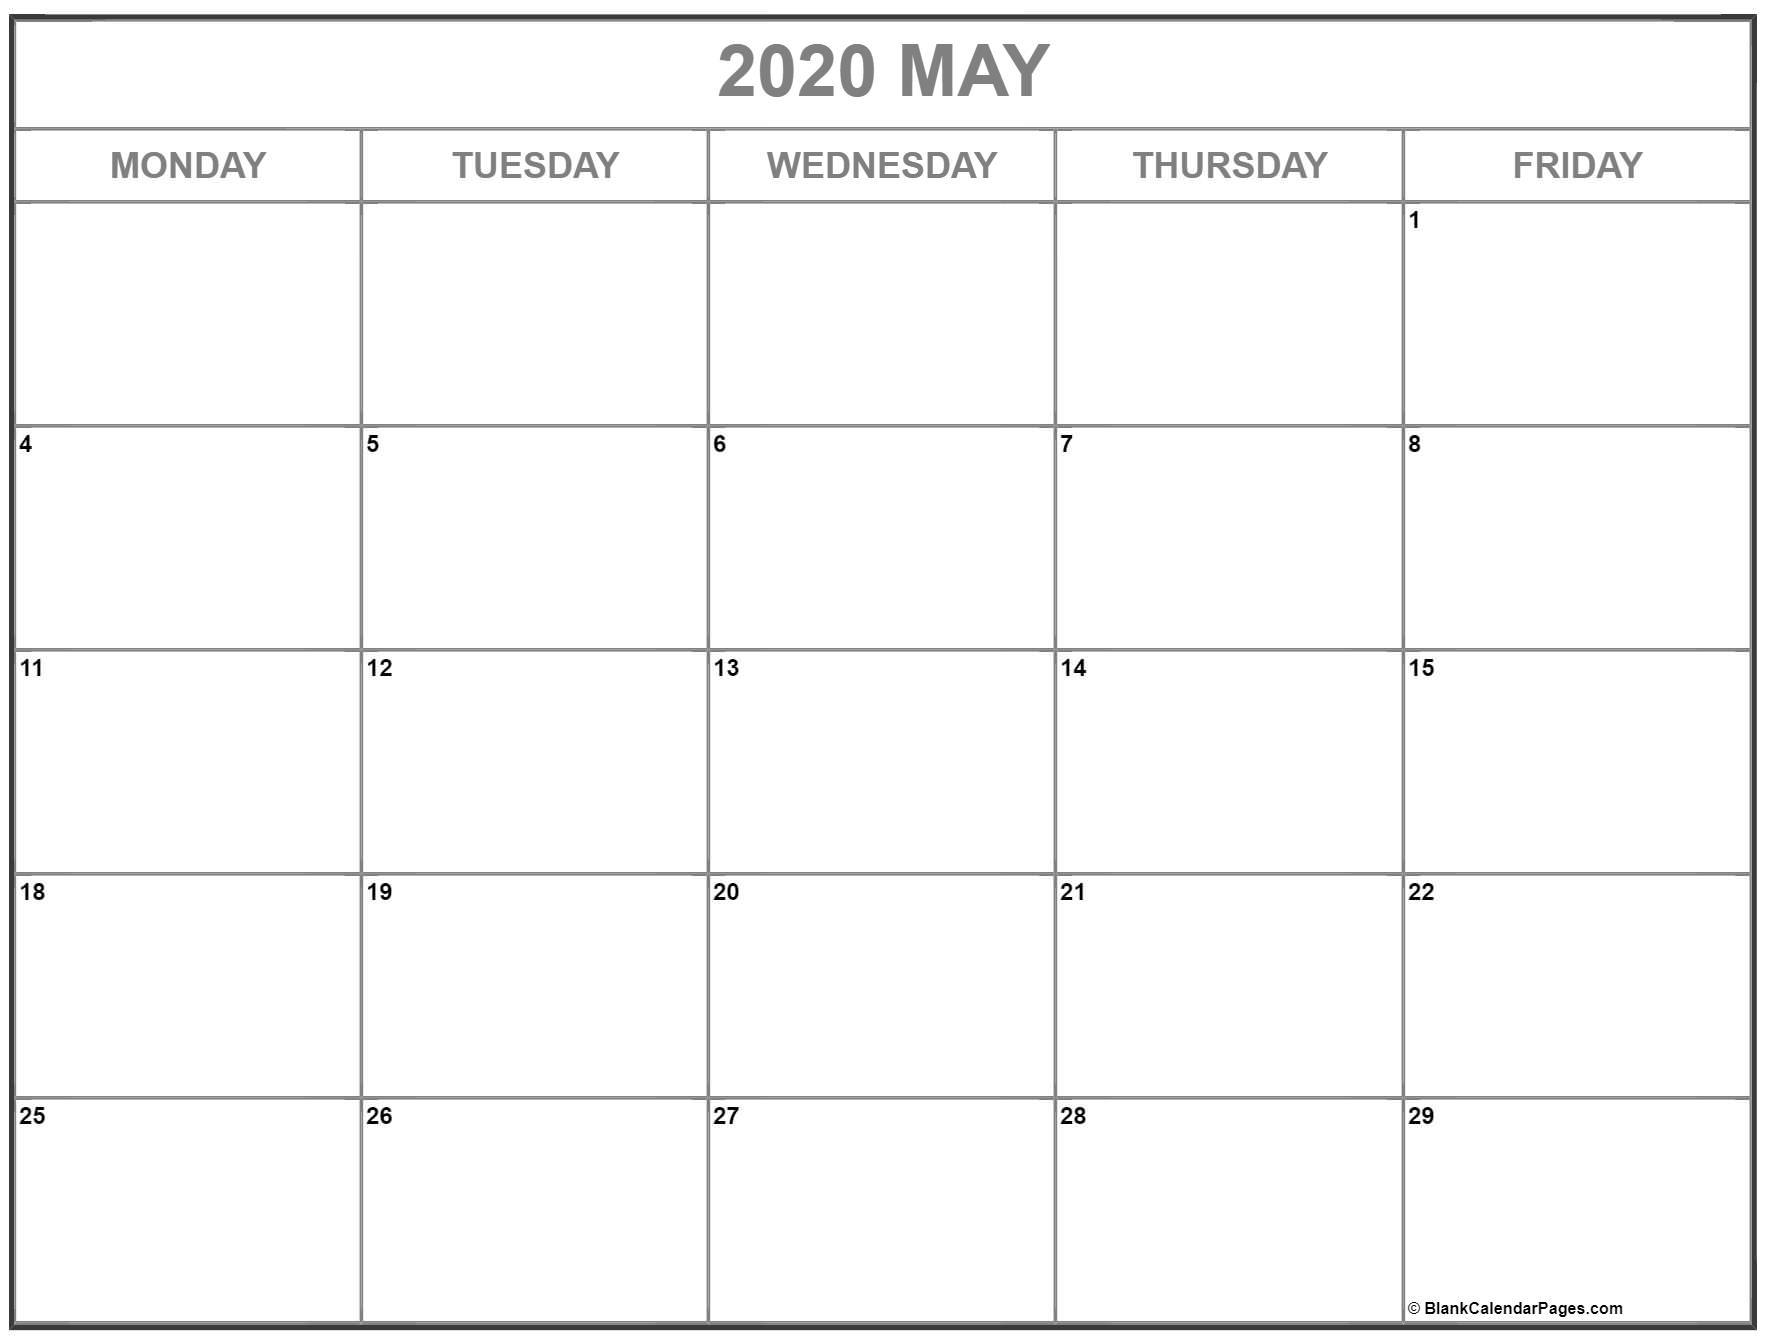 May 2020 Monday Calendar | Monday To Sunday regarding Free Printable Monday Through Friday Calendar